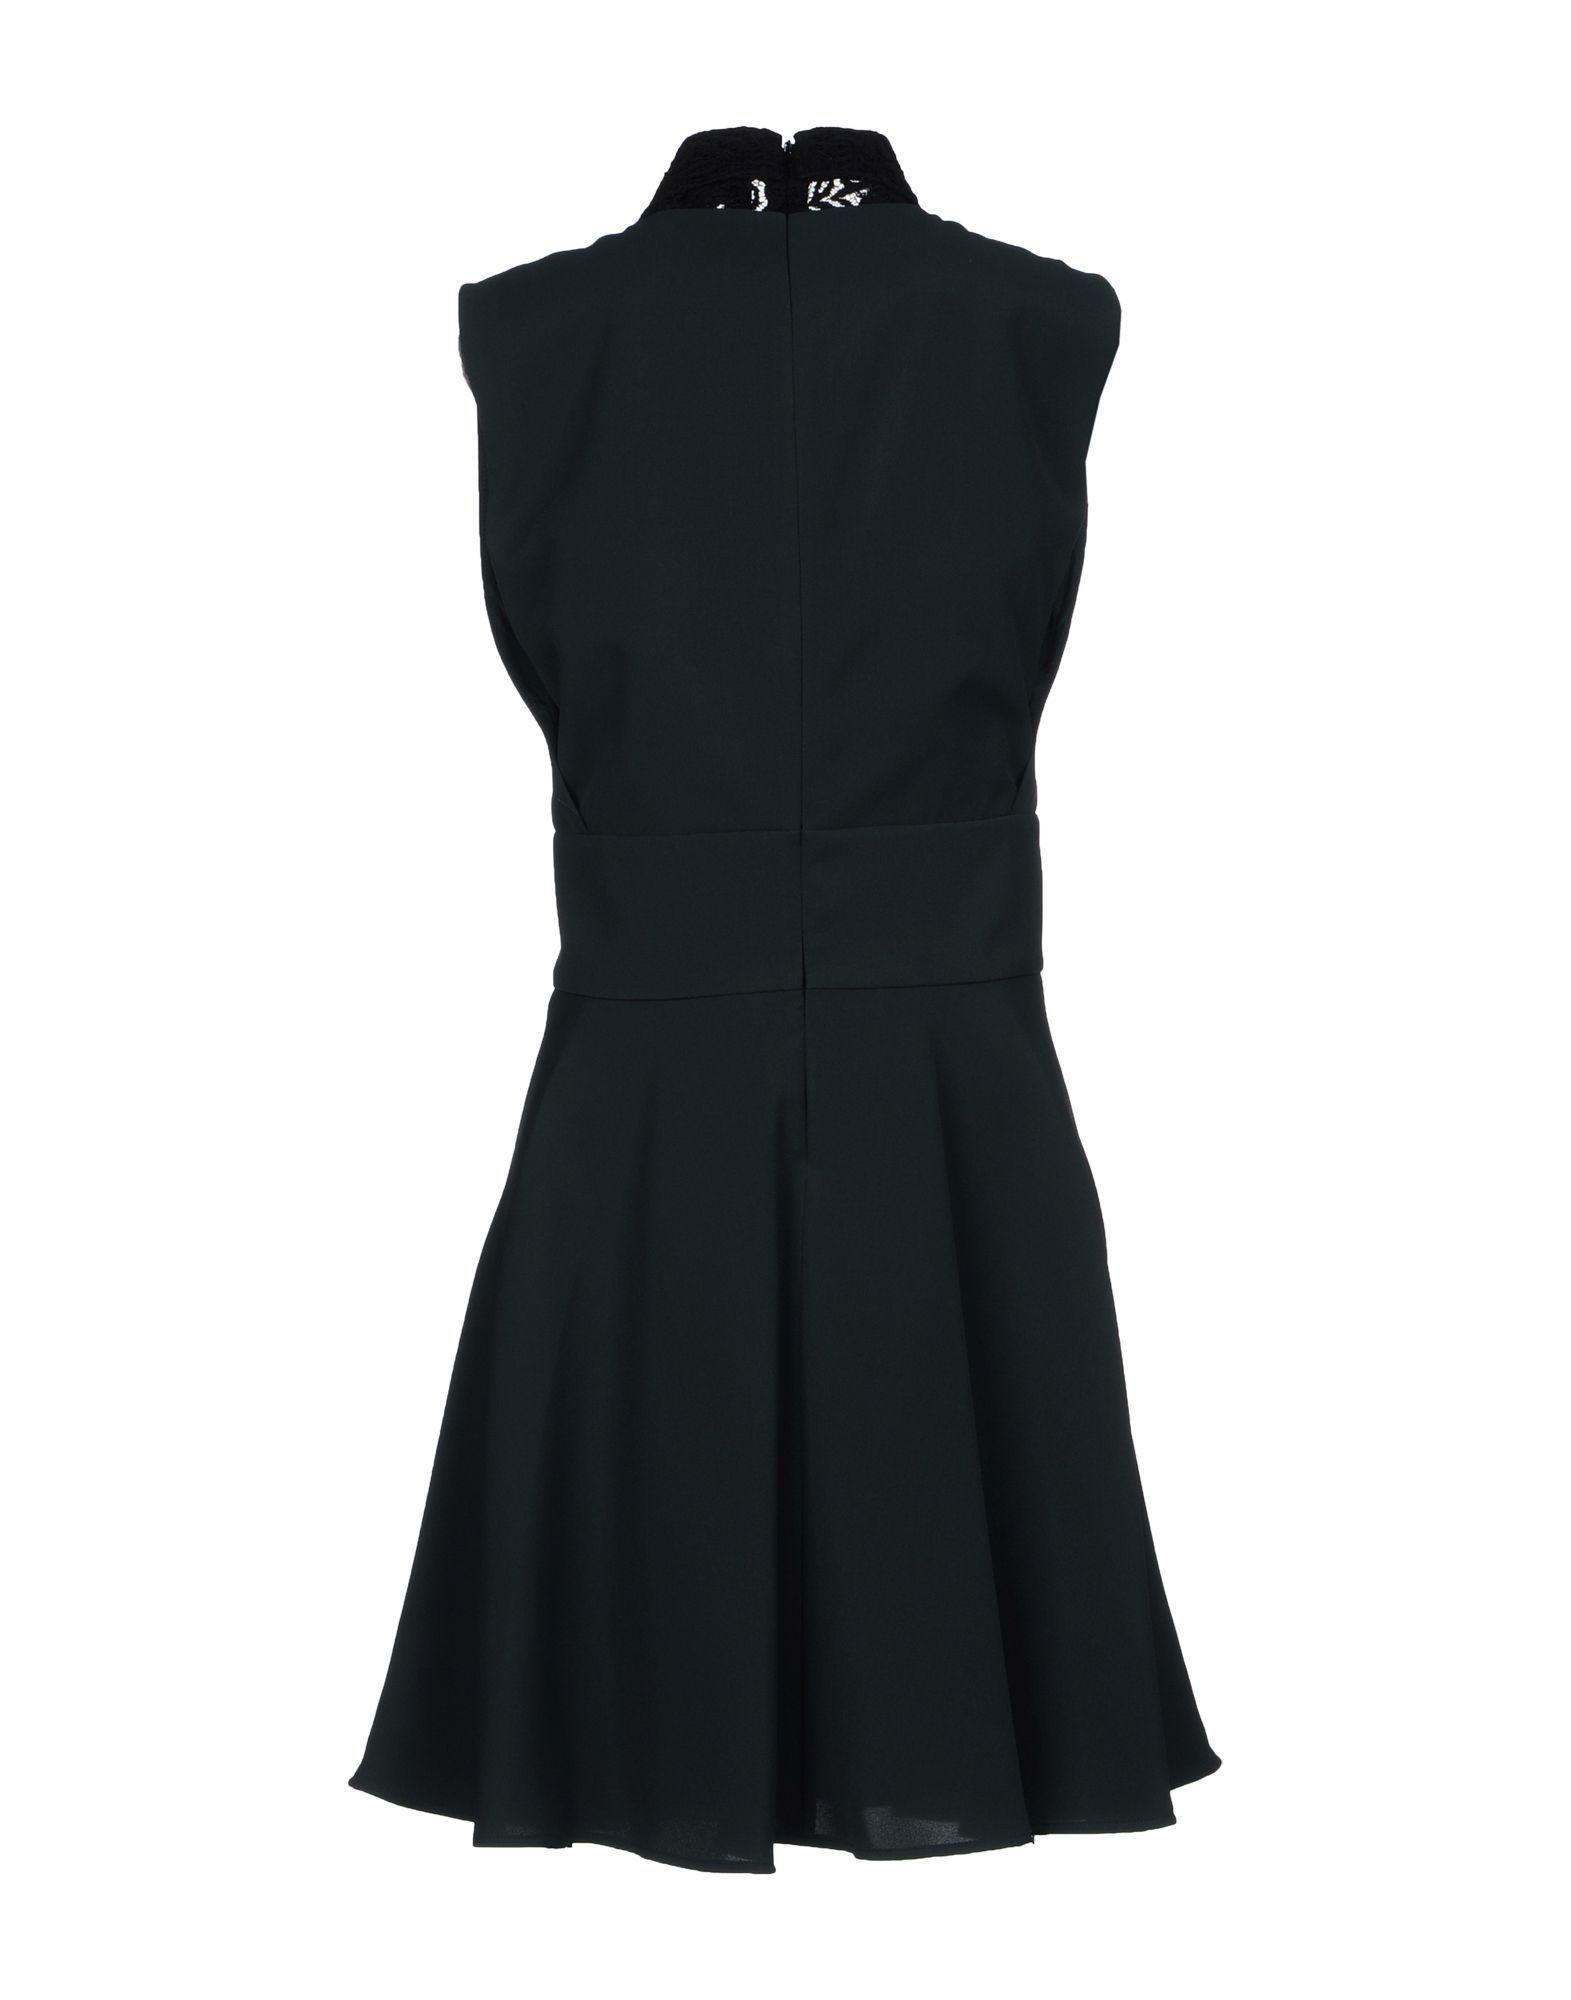 The Kooples Dark Green Lace Sleeveless Dress